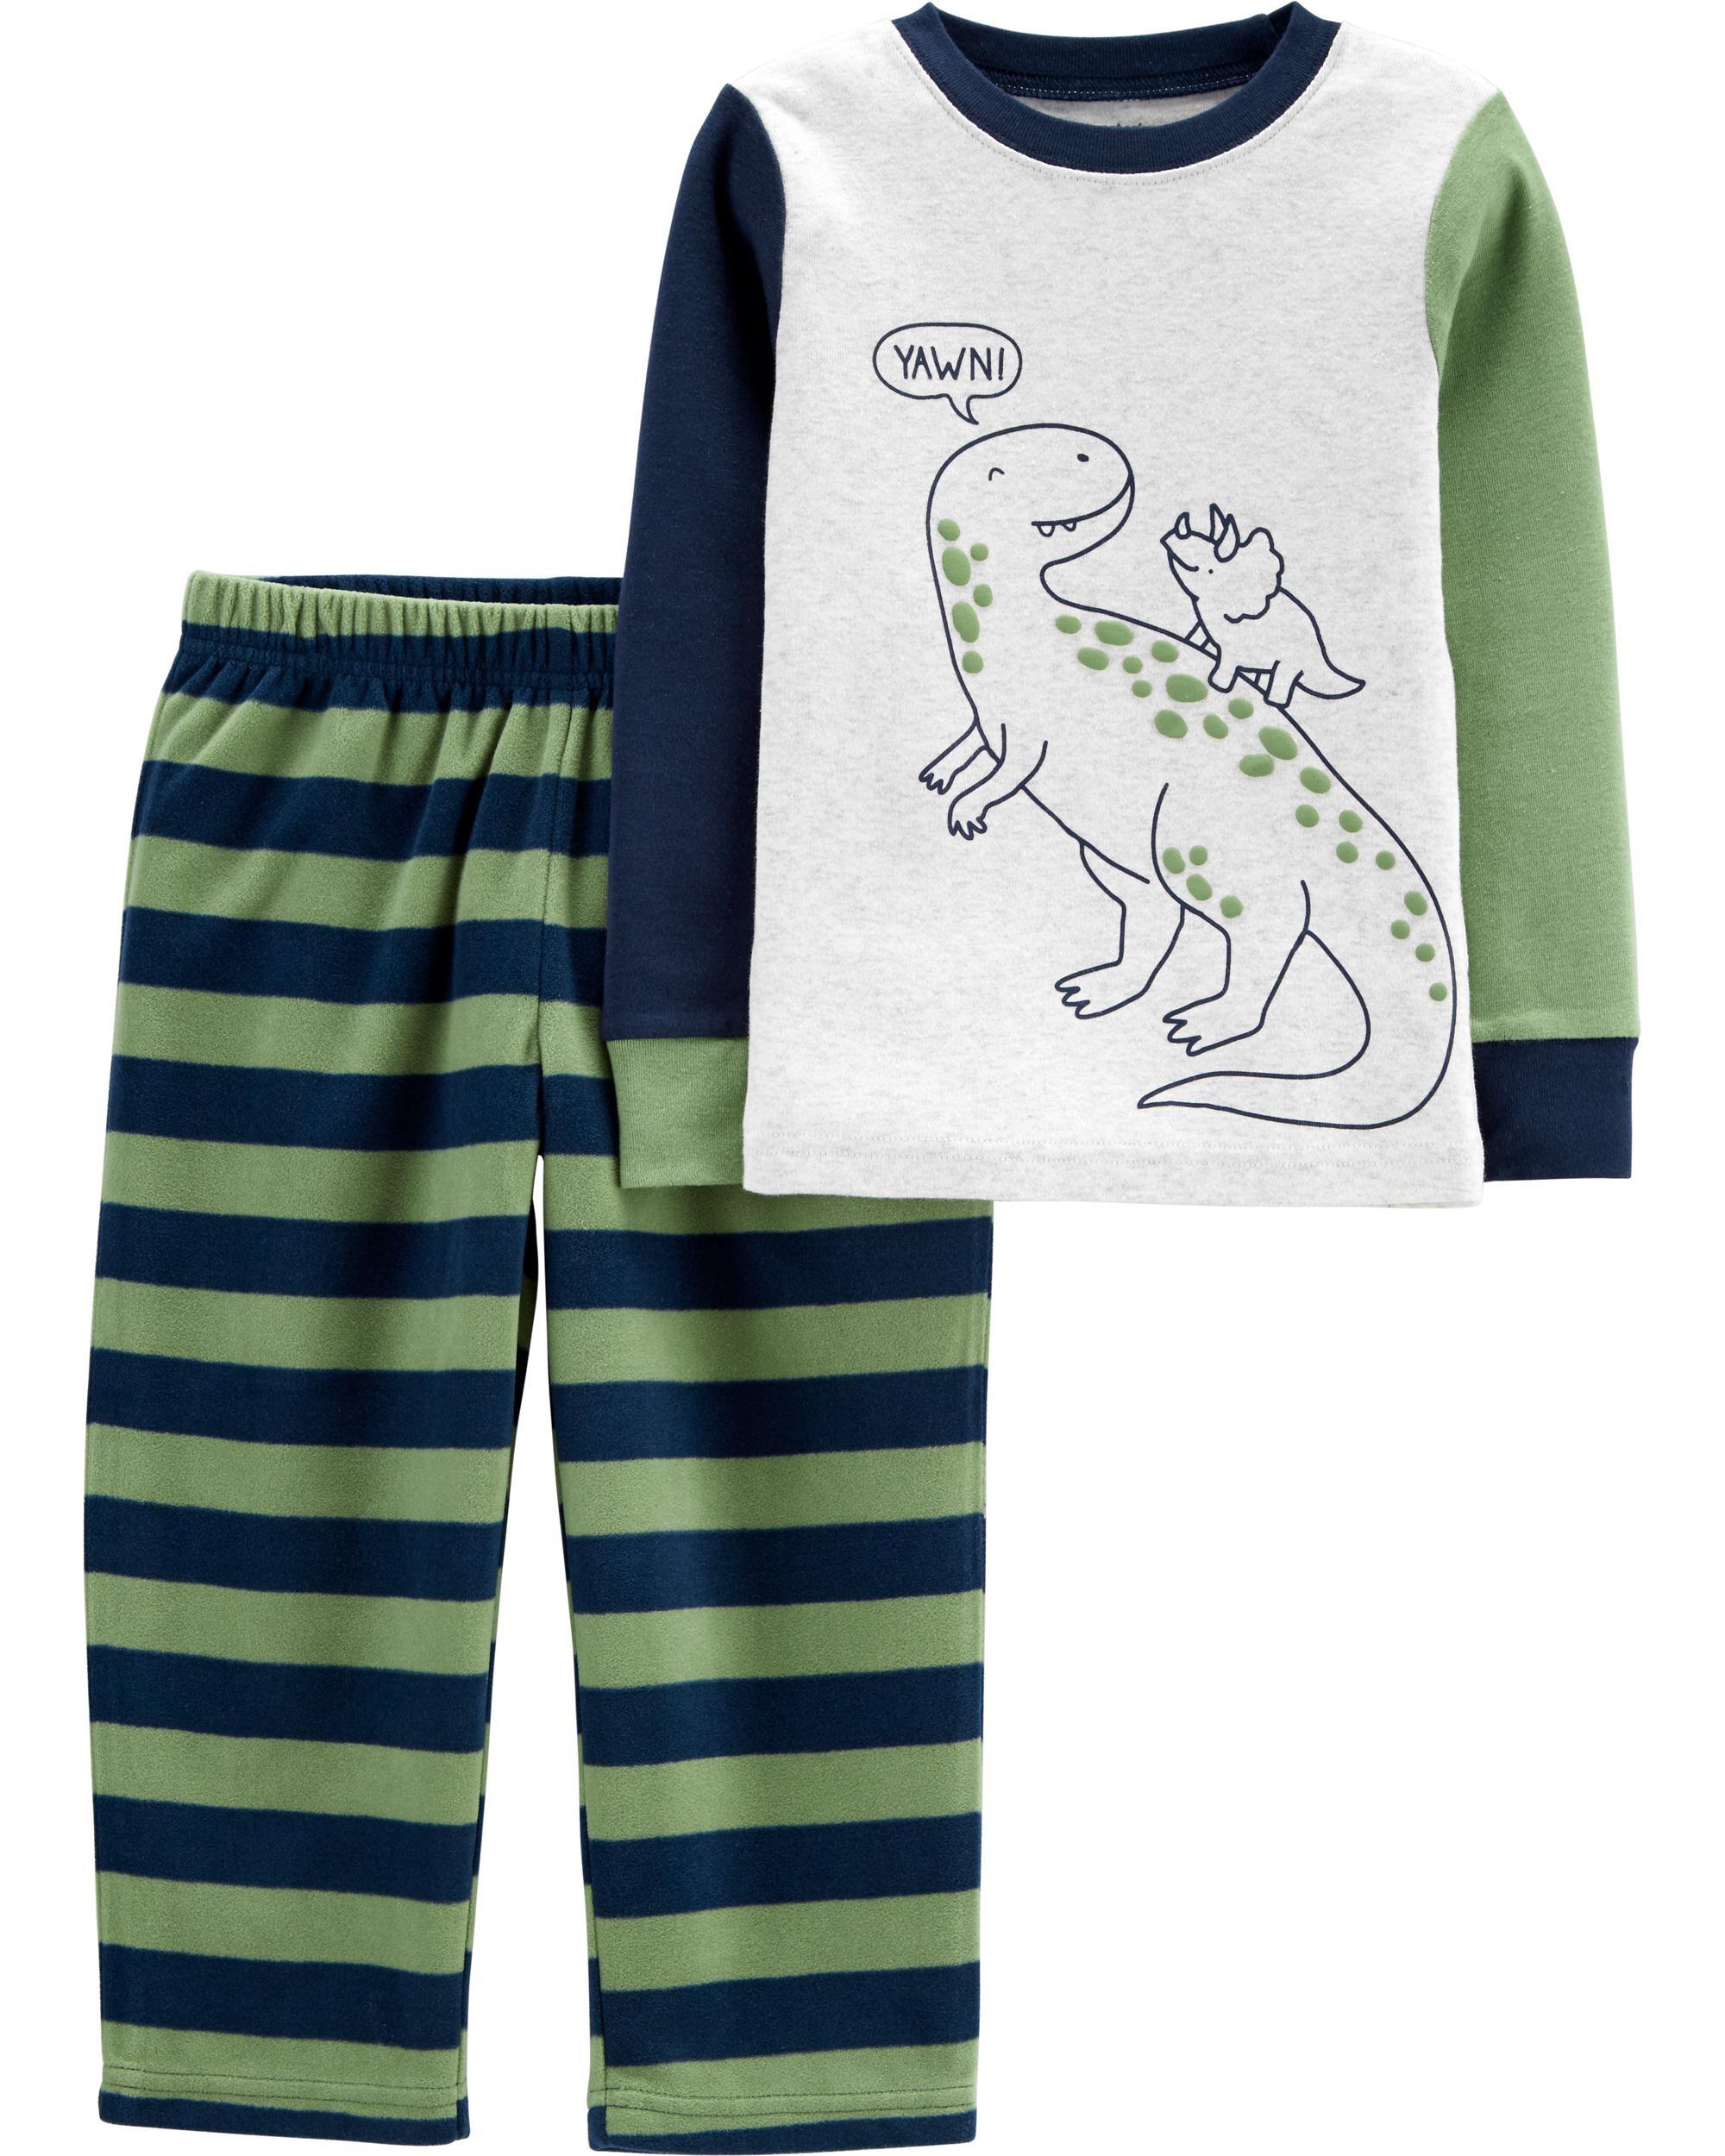 Childrens Pyjamas Long Sleeve Top//Check Pant//Bottom Boys//Kids soft fleece winter